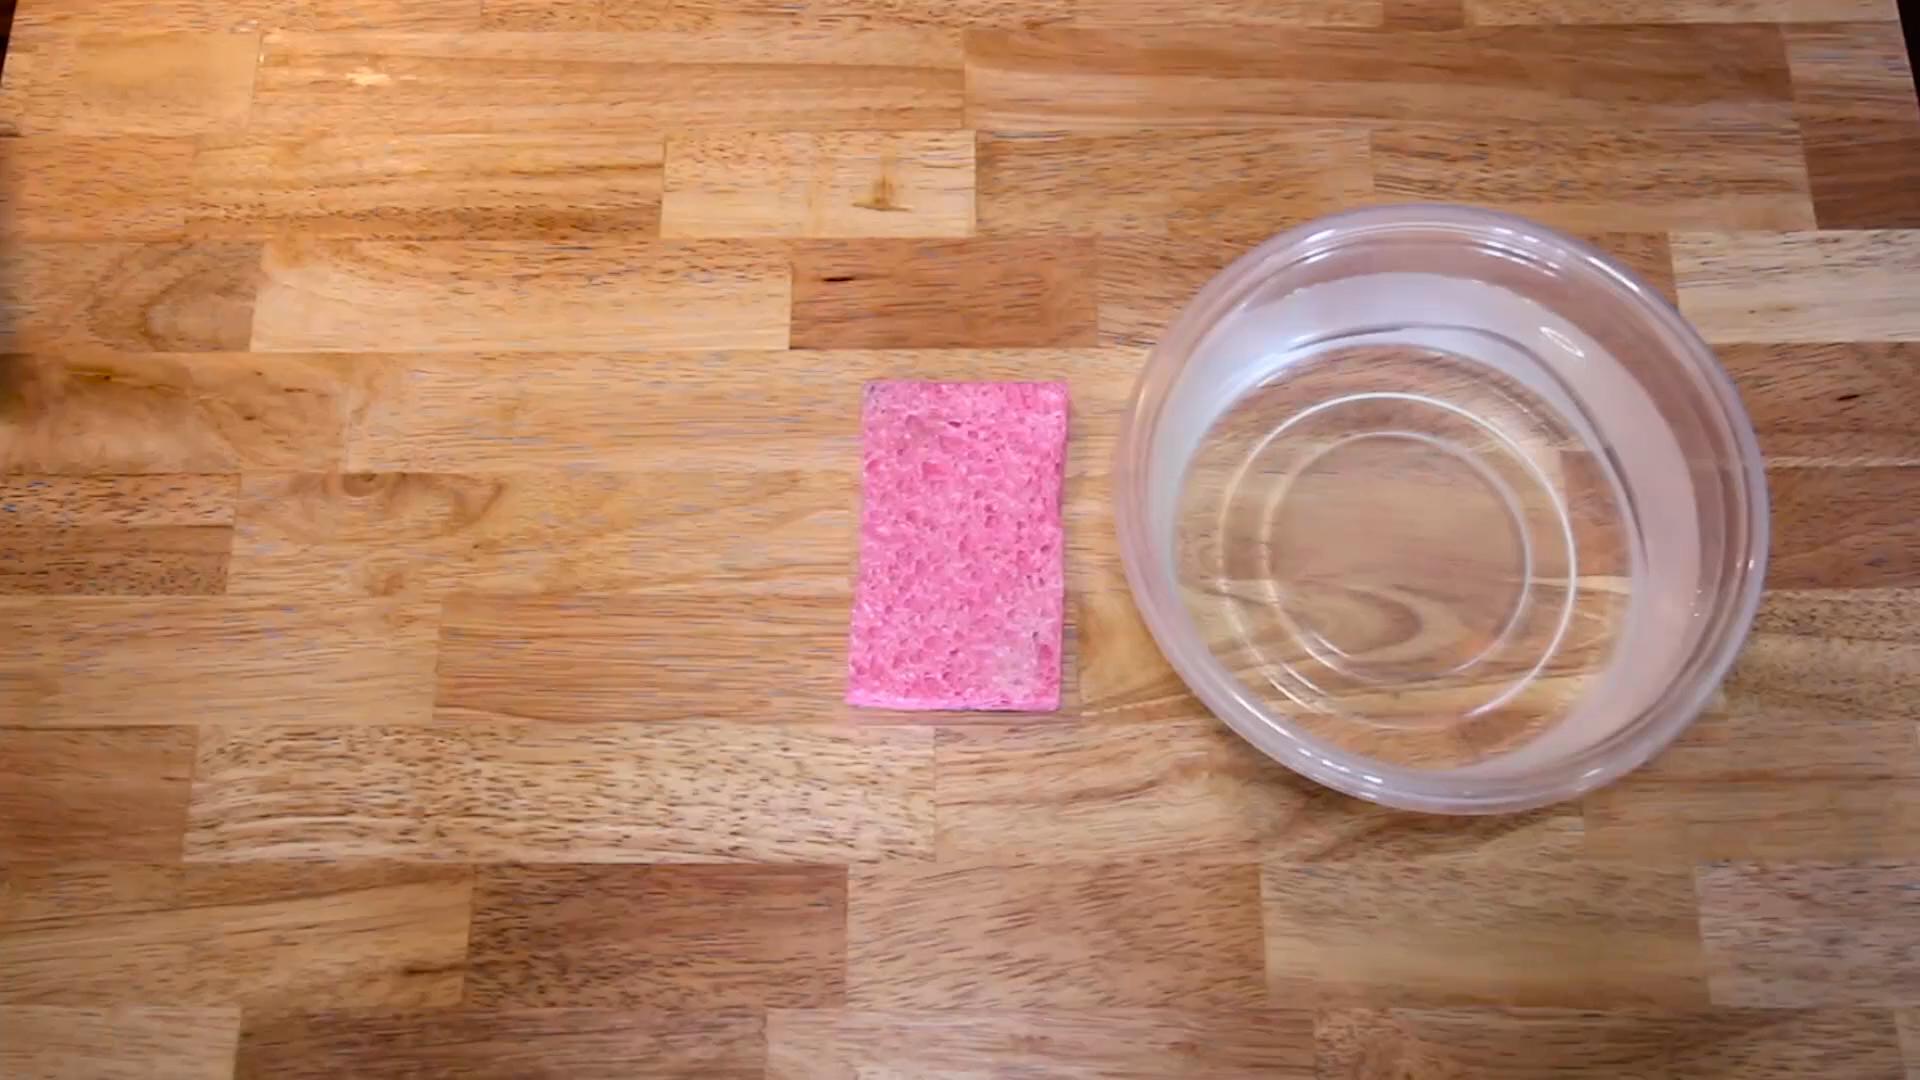 Four Surprising Uses for Kitchen Sponges